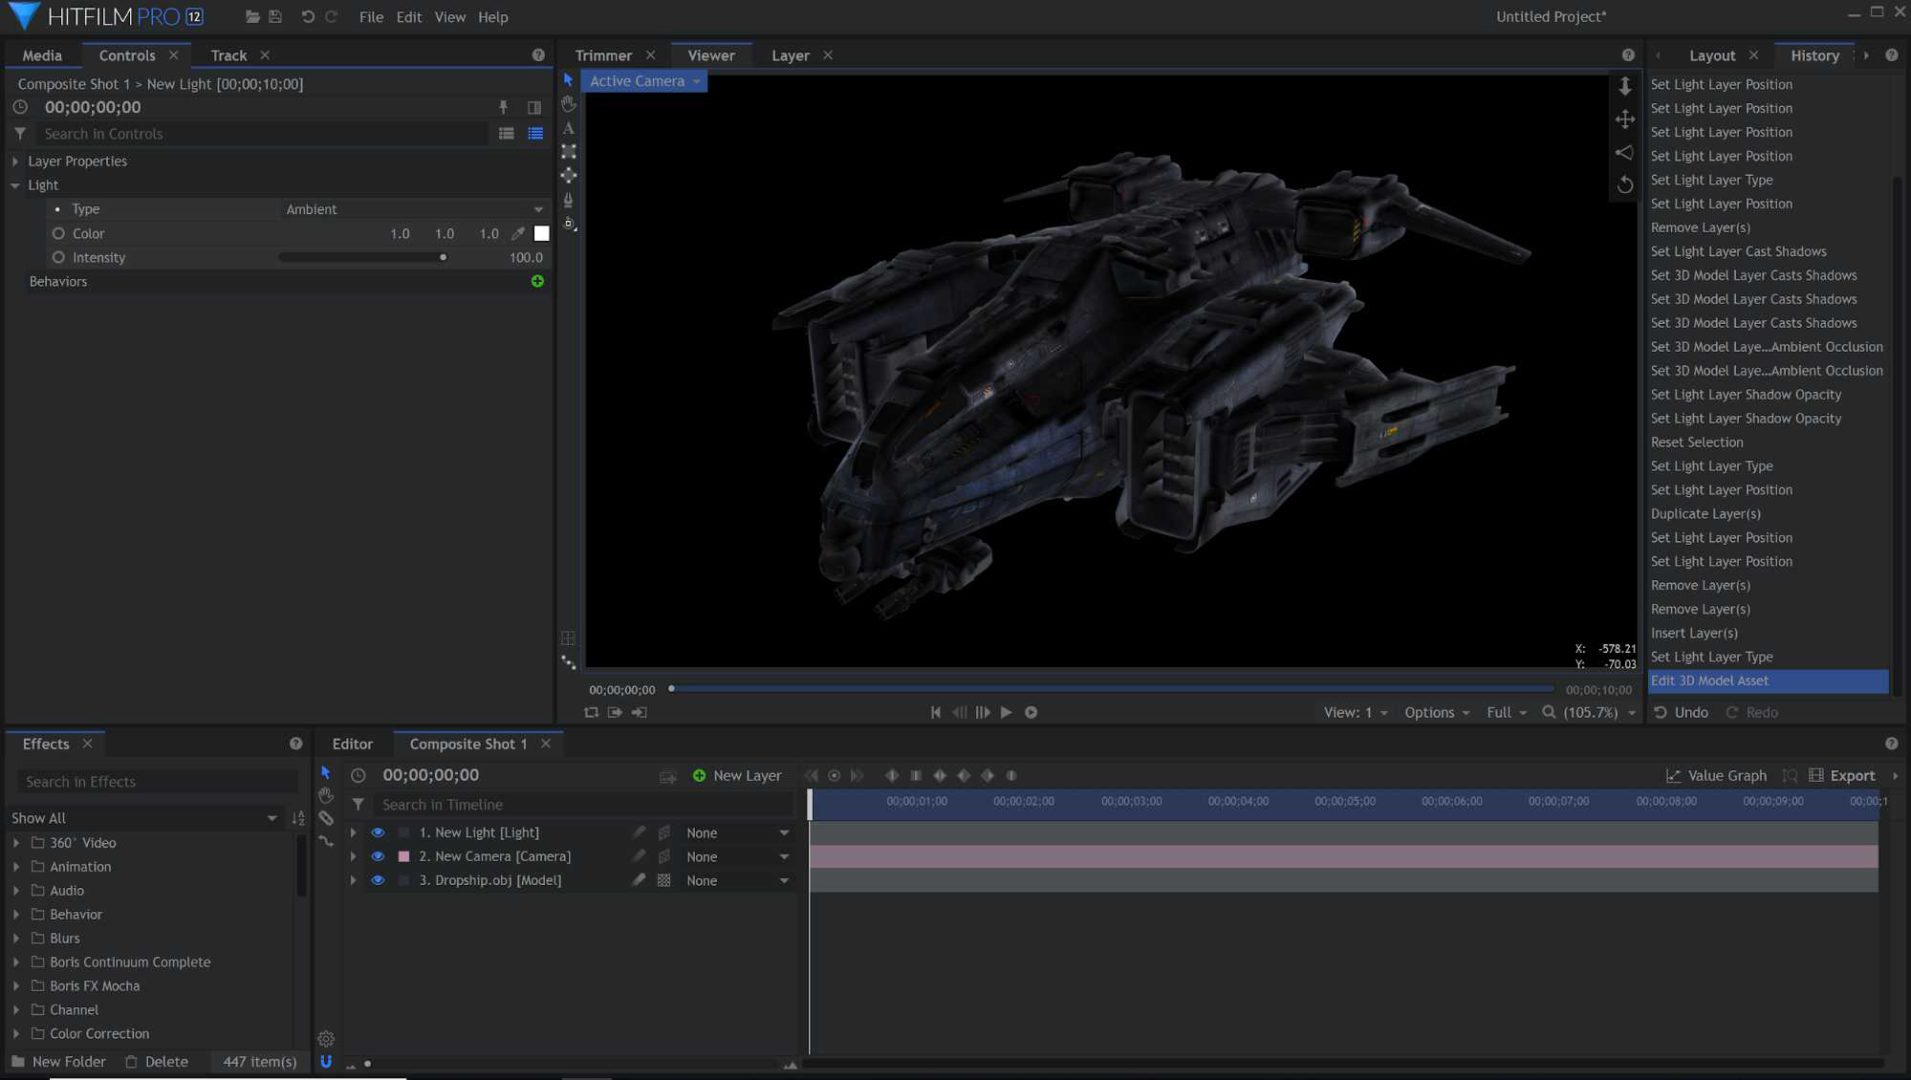 3D model textures in HitFilm Pro